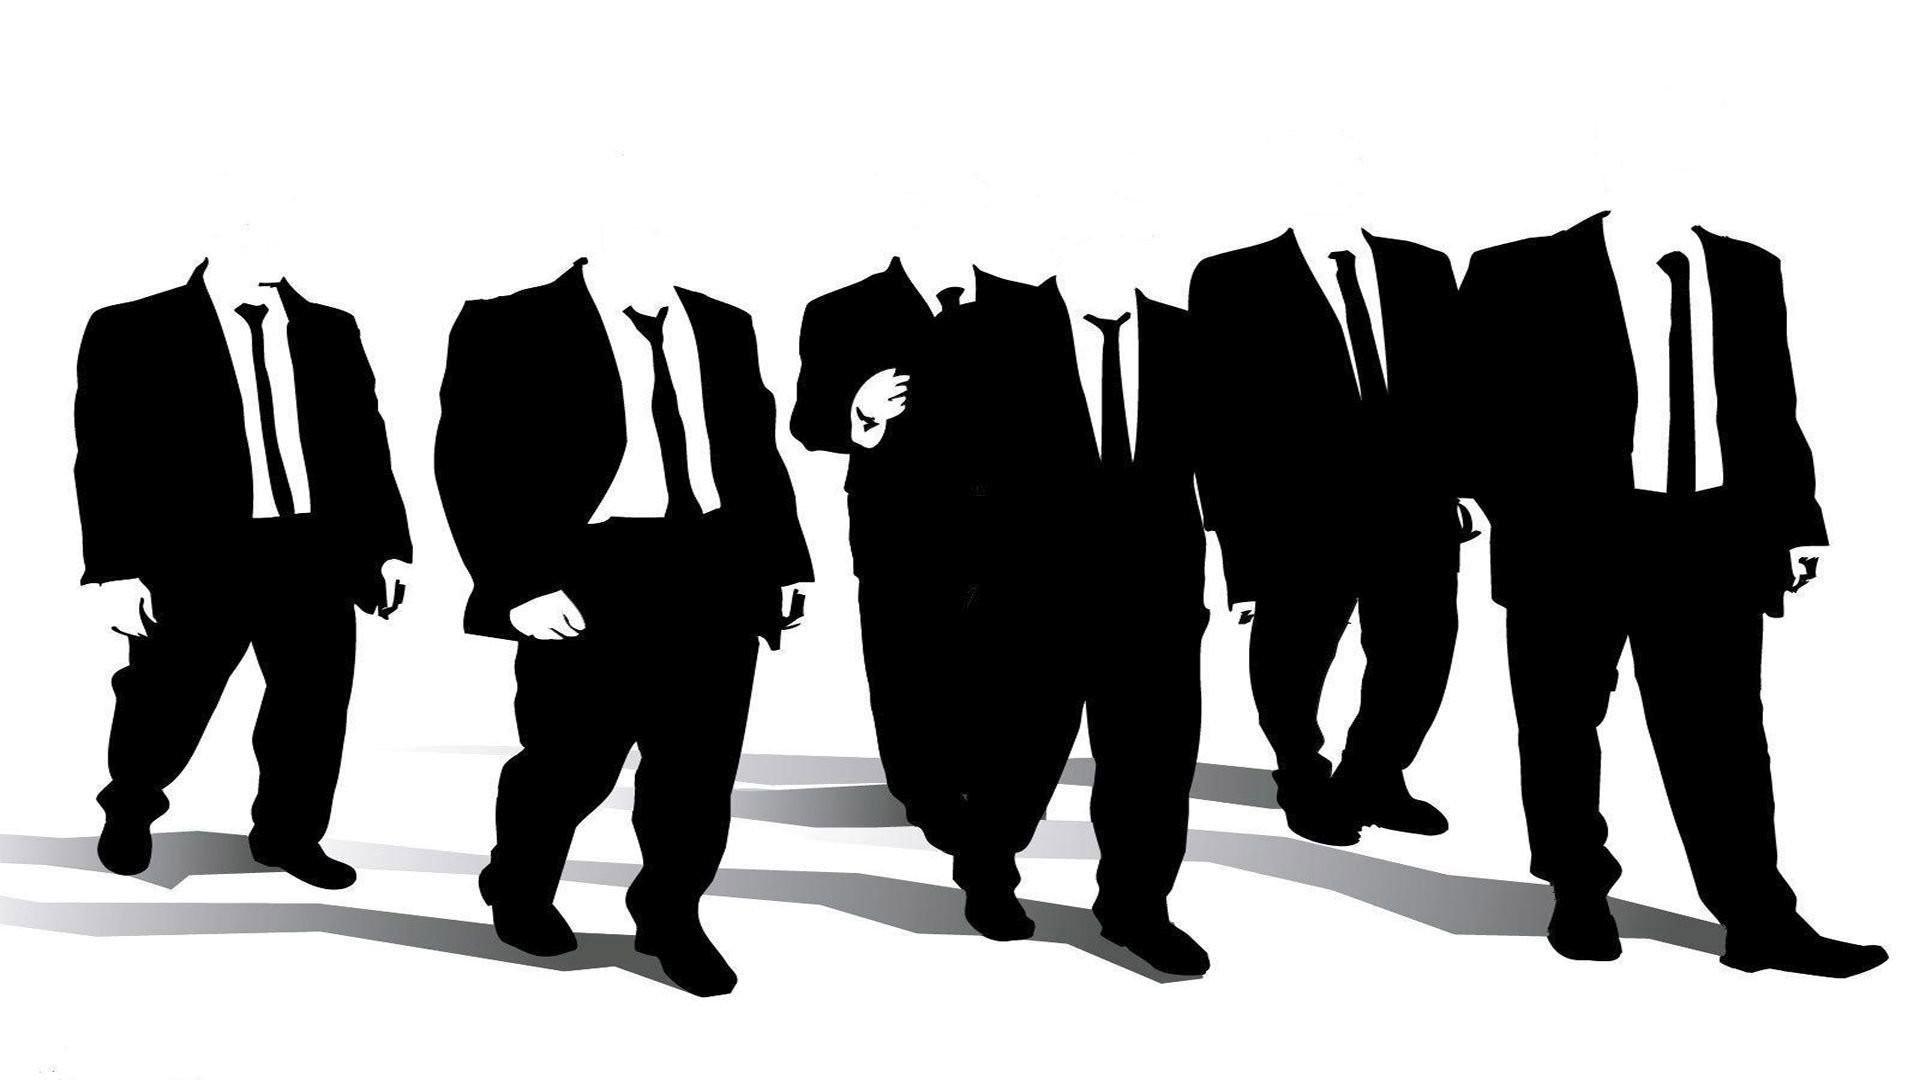 Reservoir Dogs 820165